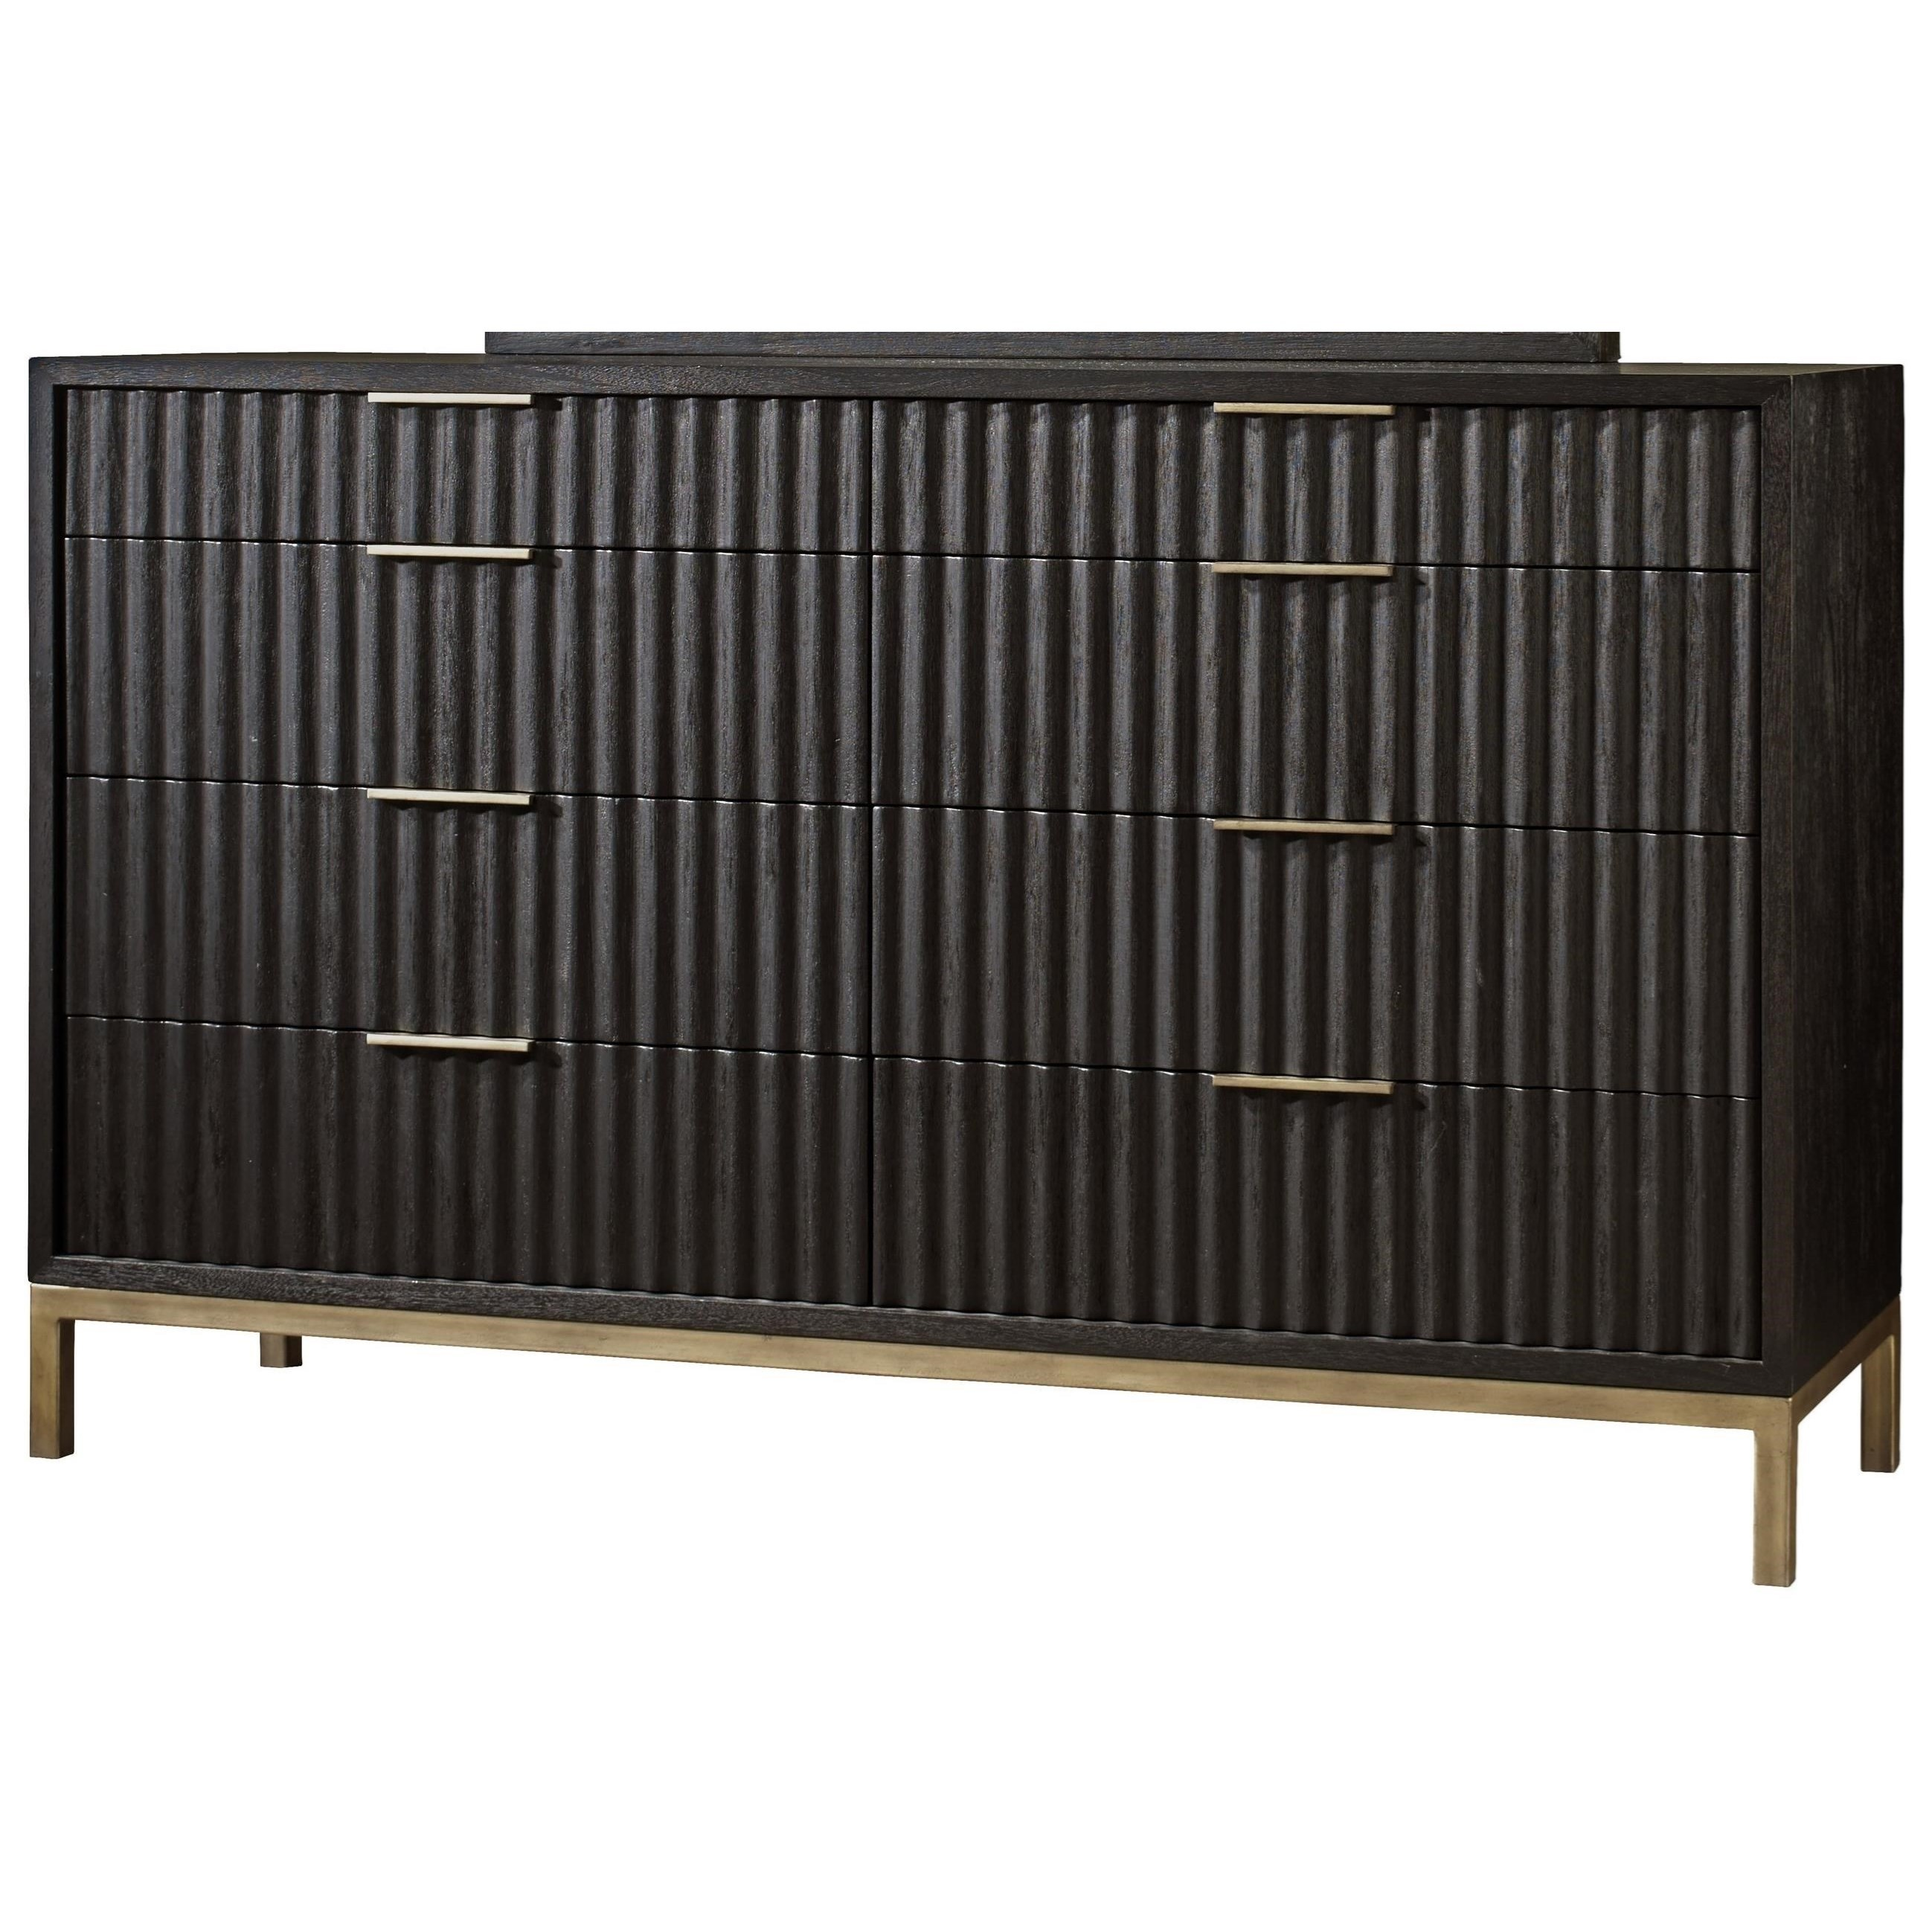 Kentfield Dresser by Modus International at Red Knot